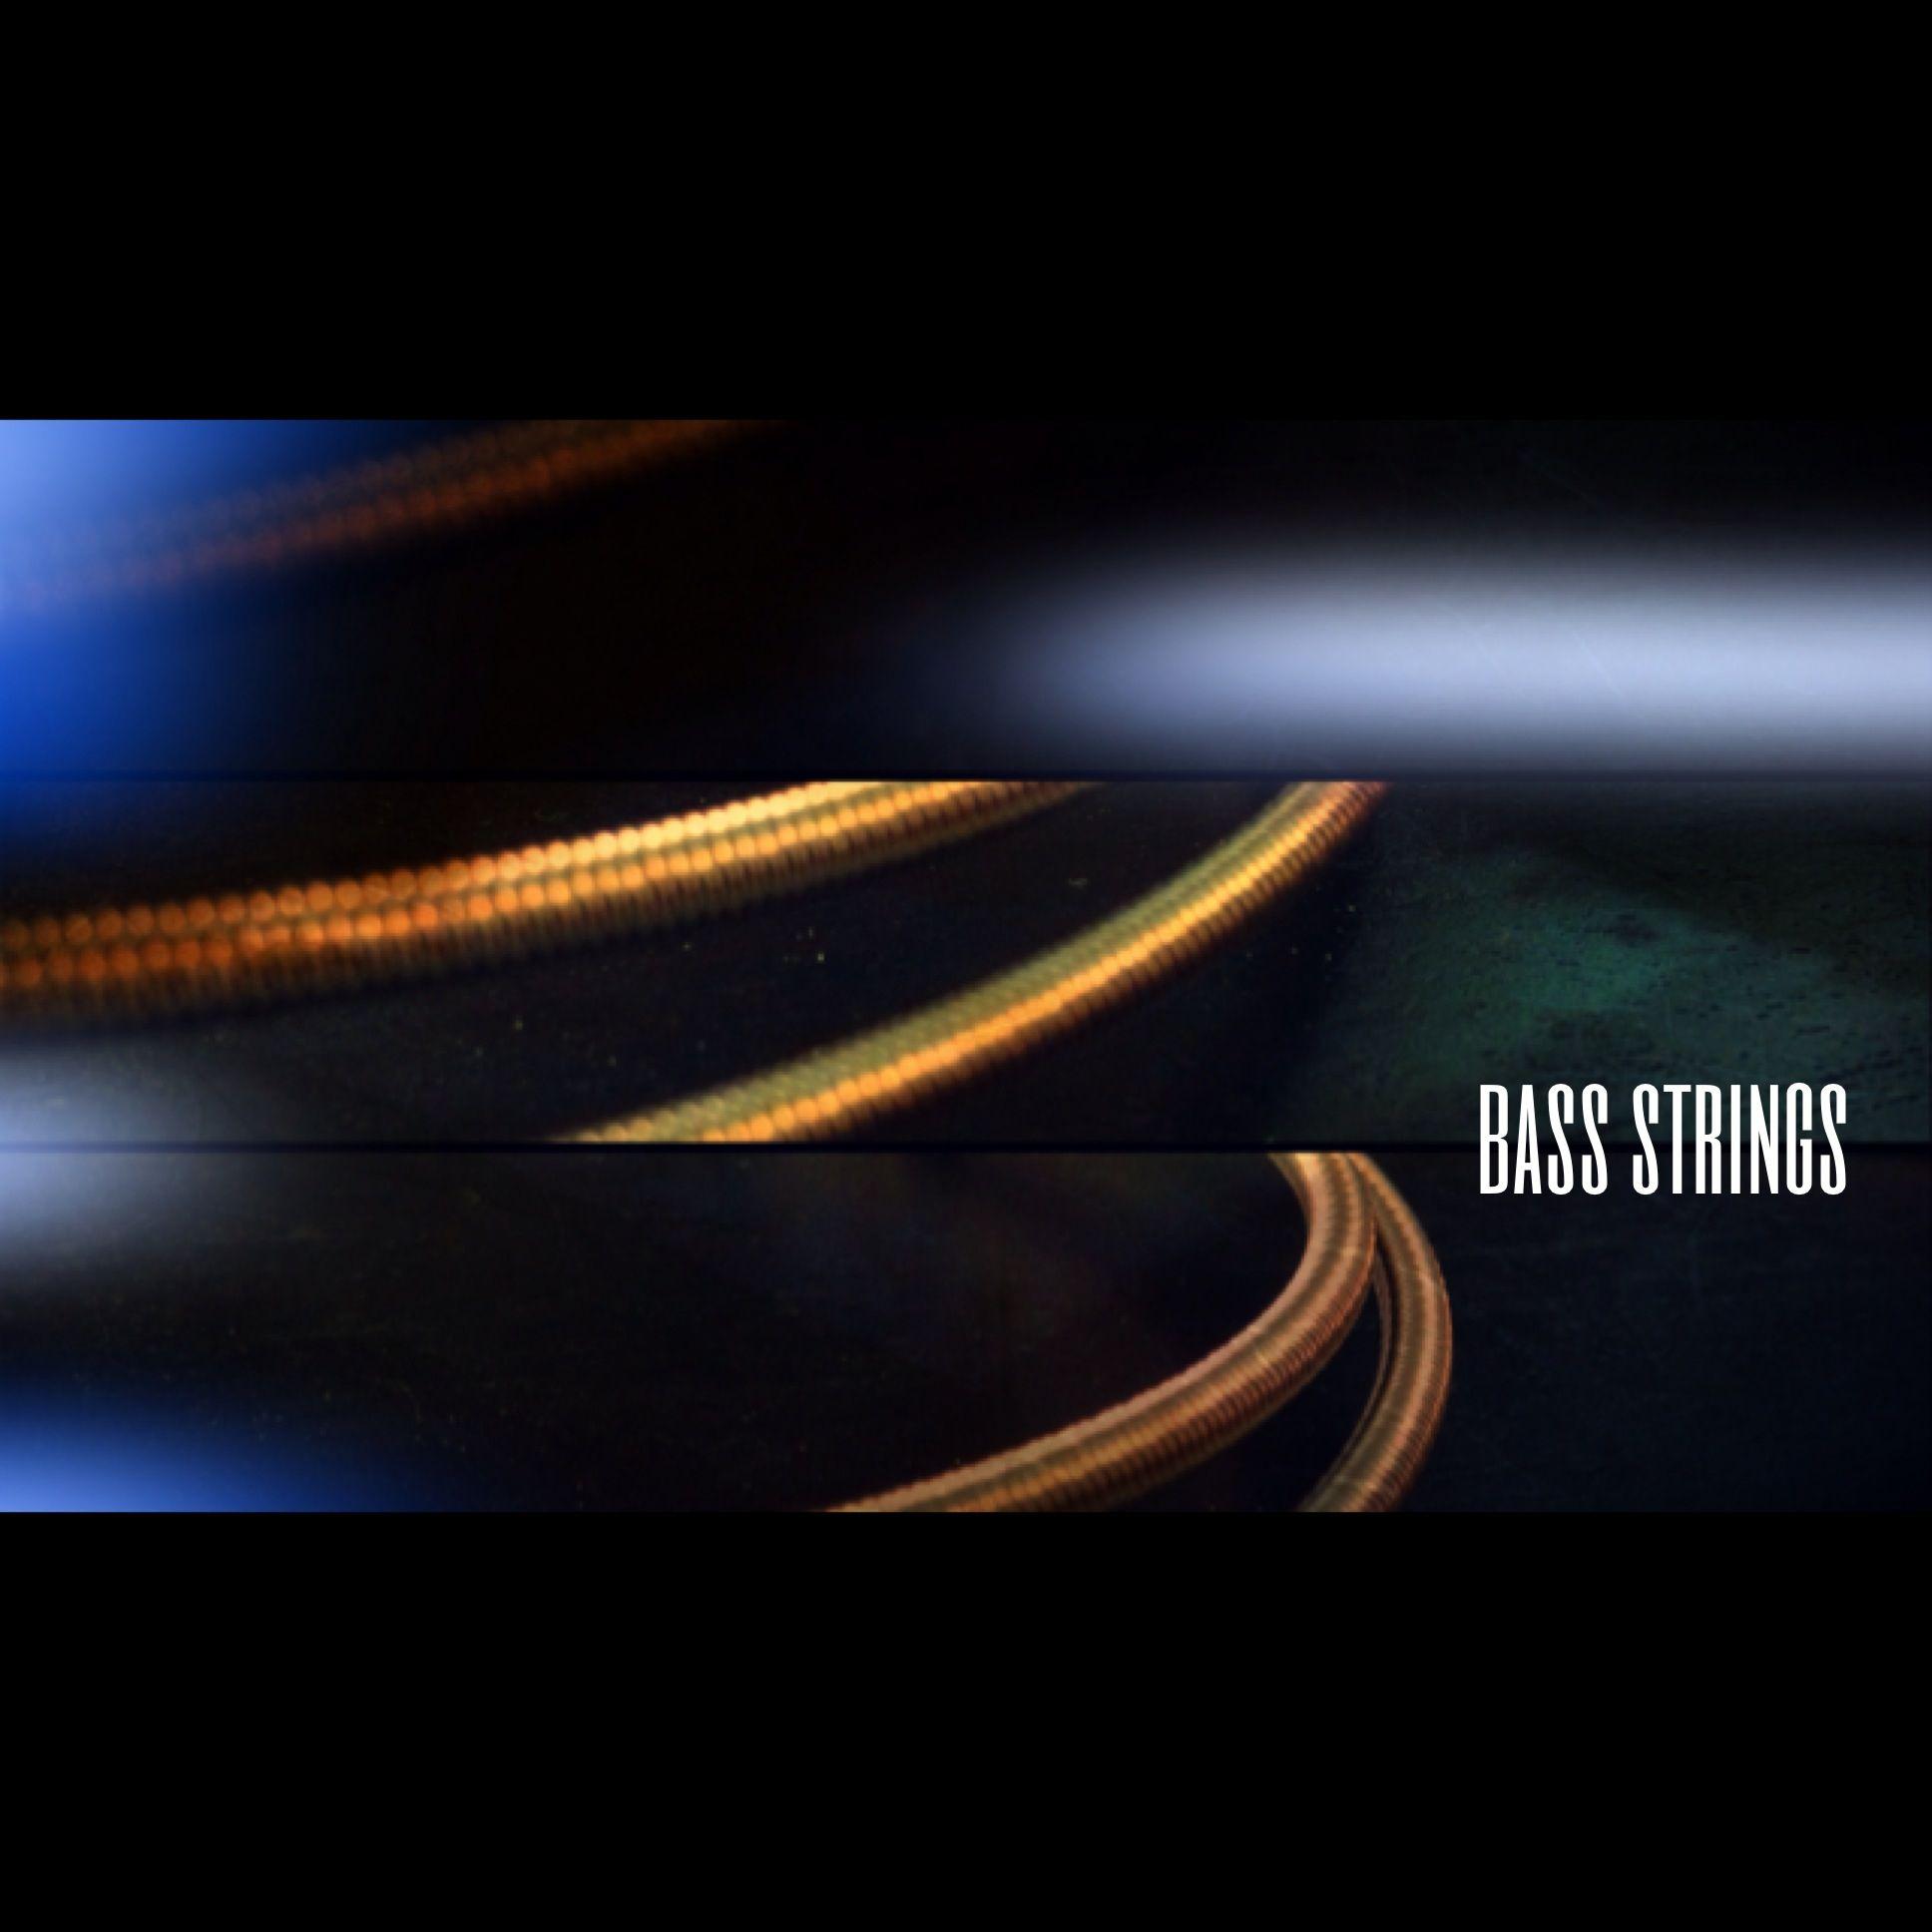 bass strings.